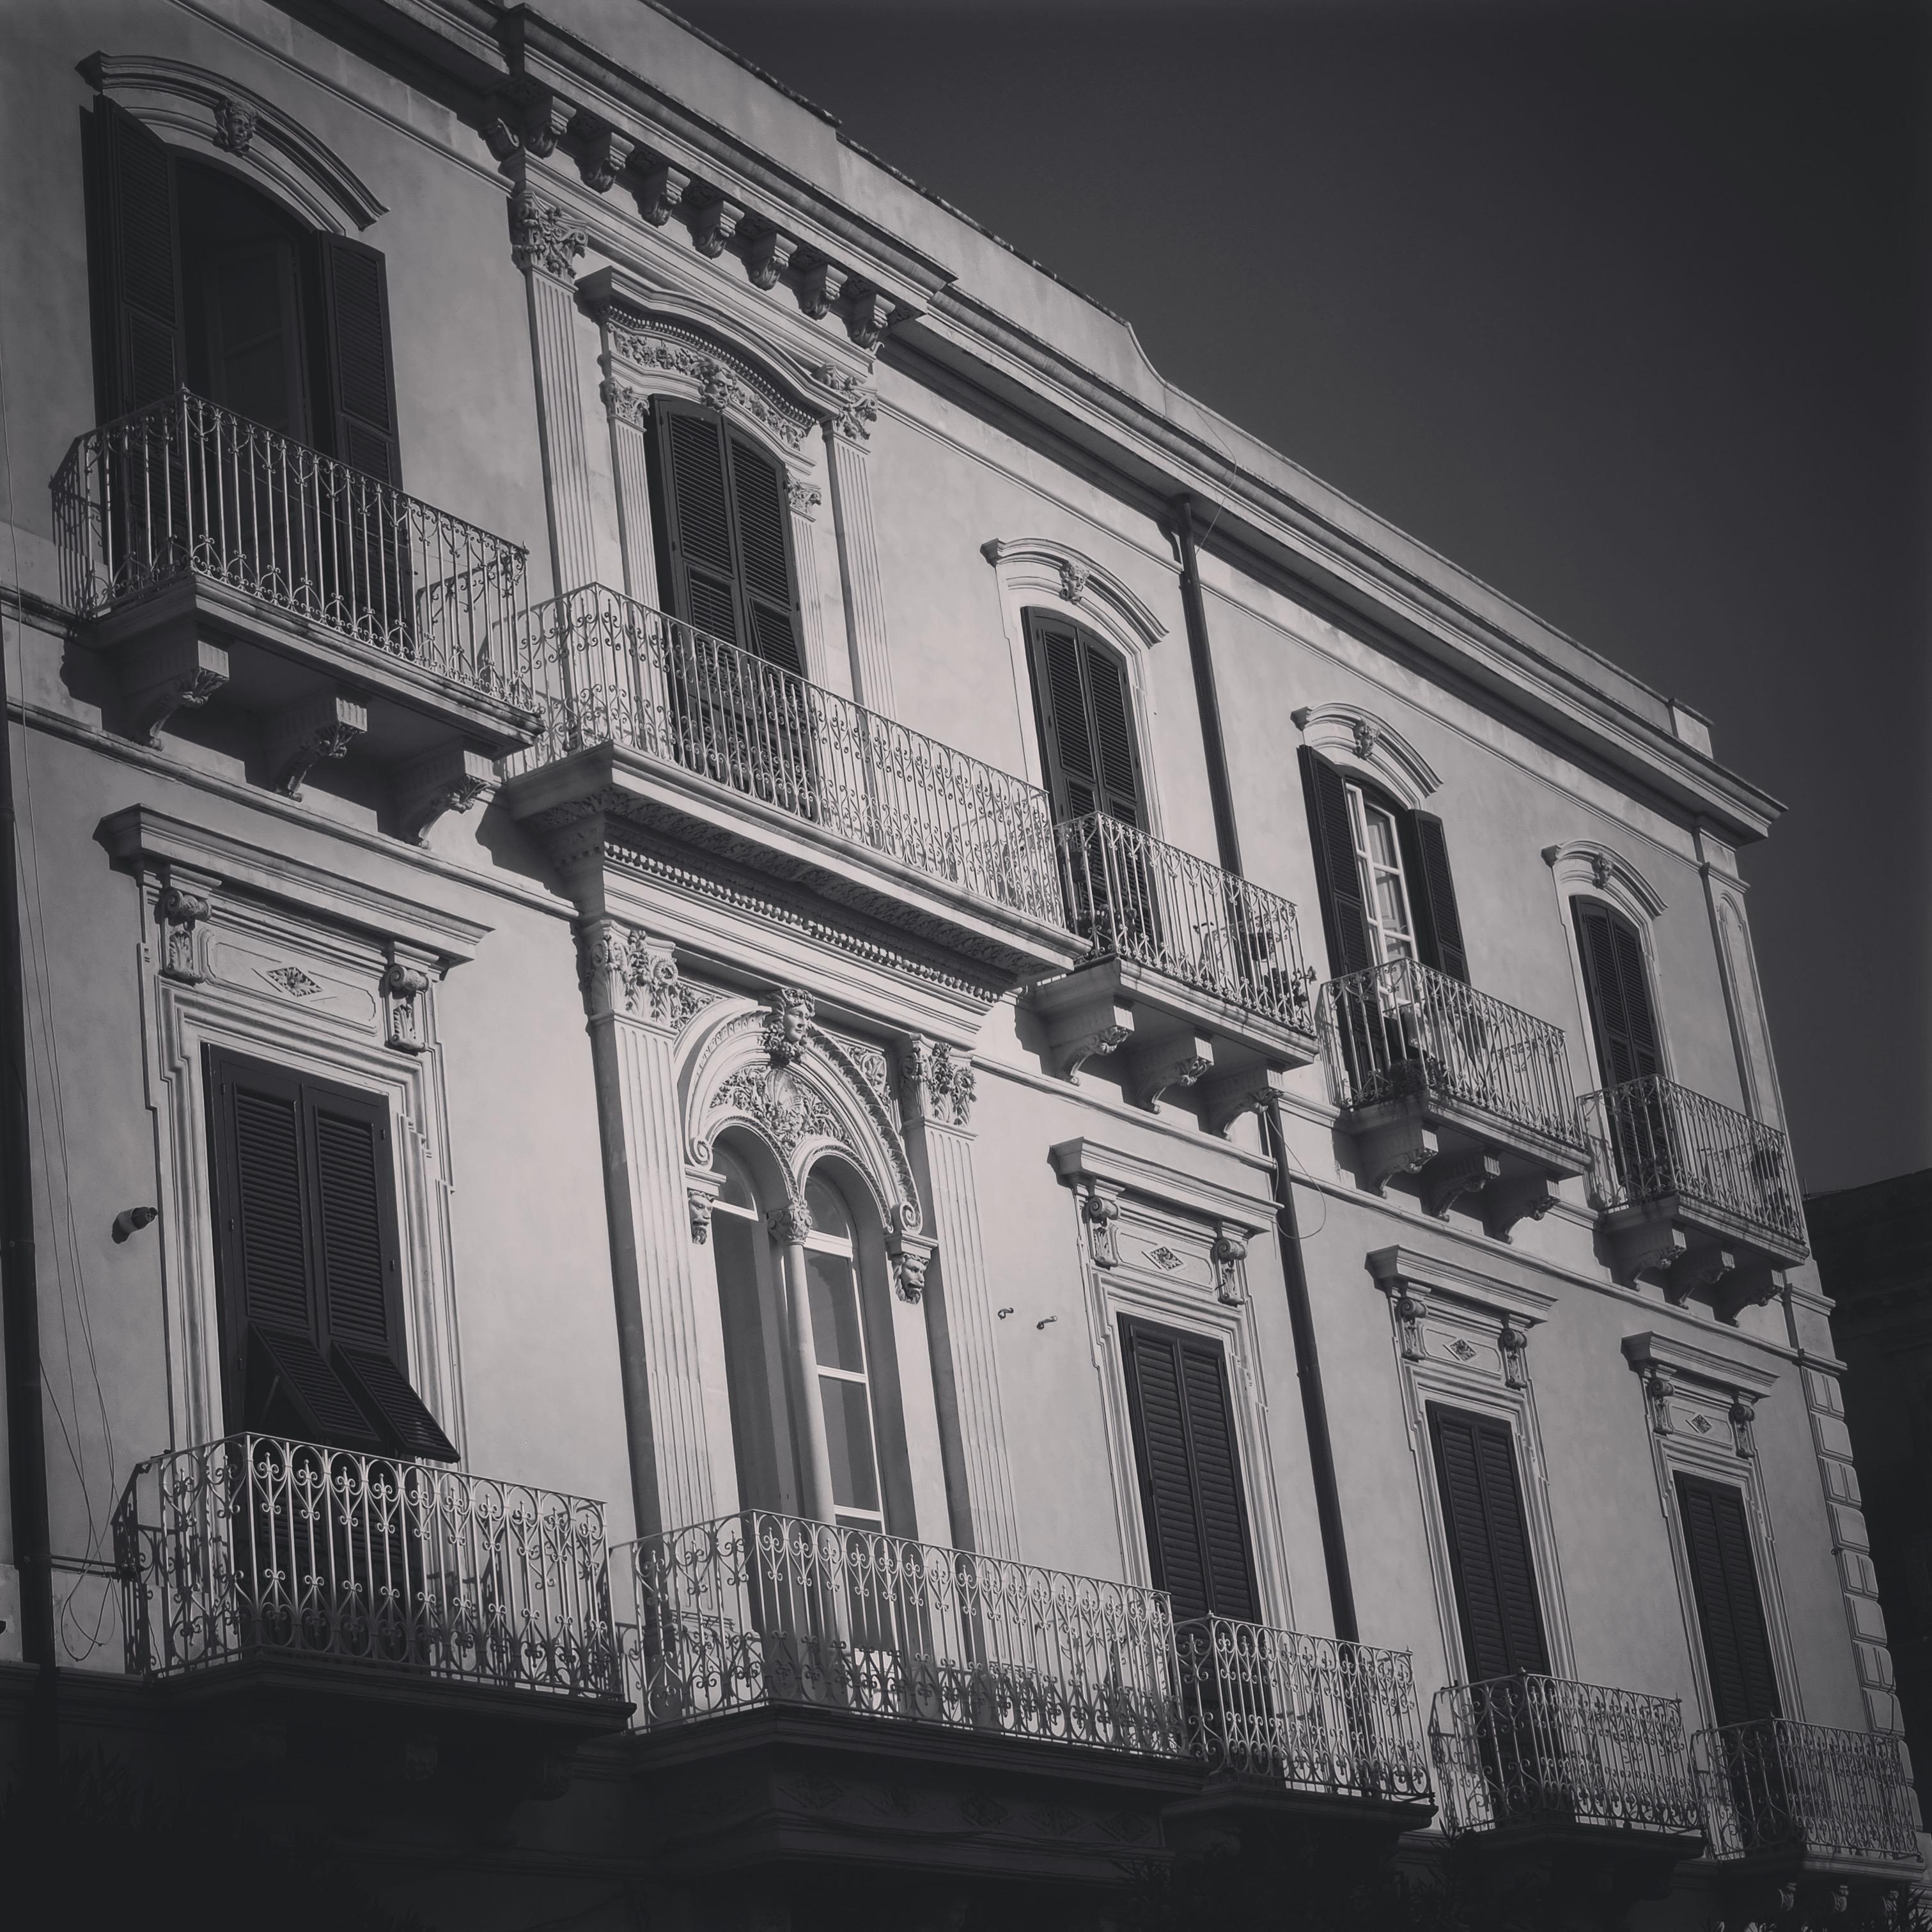 Siracusa Architecture via Instagram [Photo]